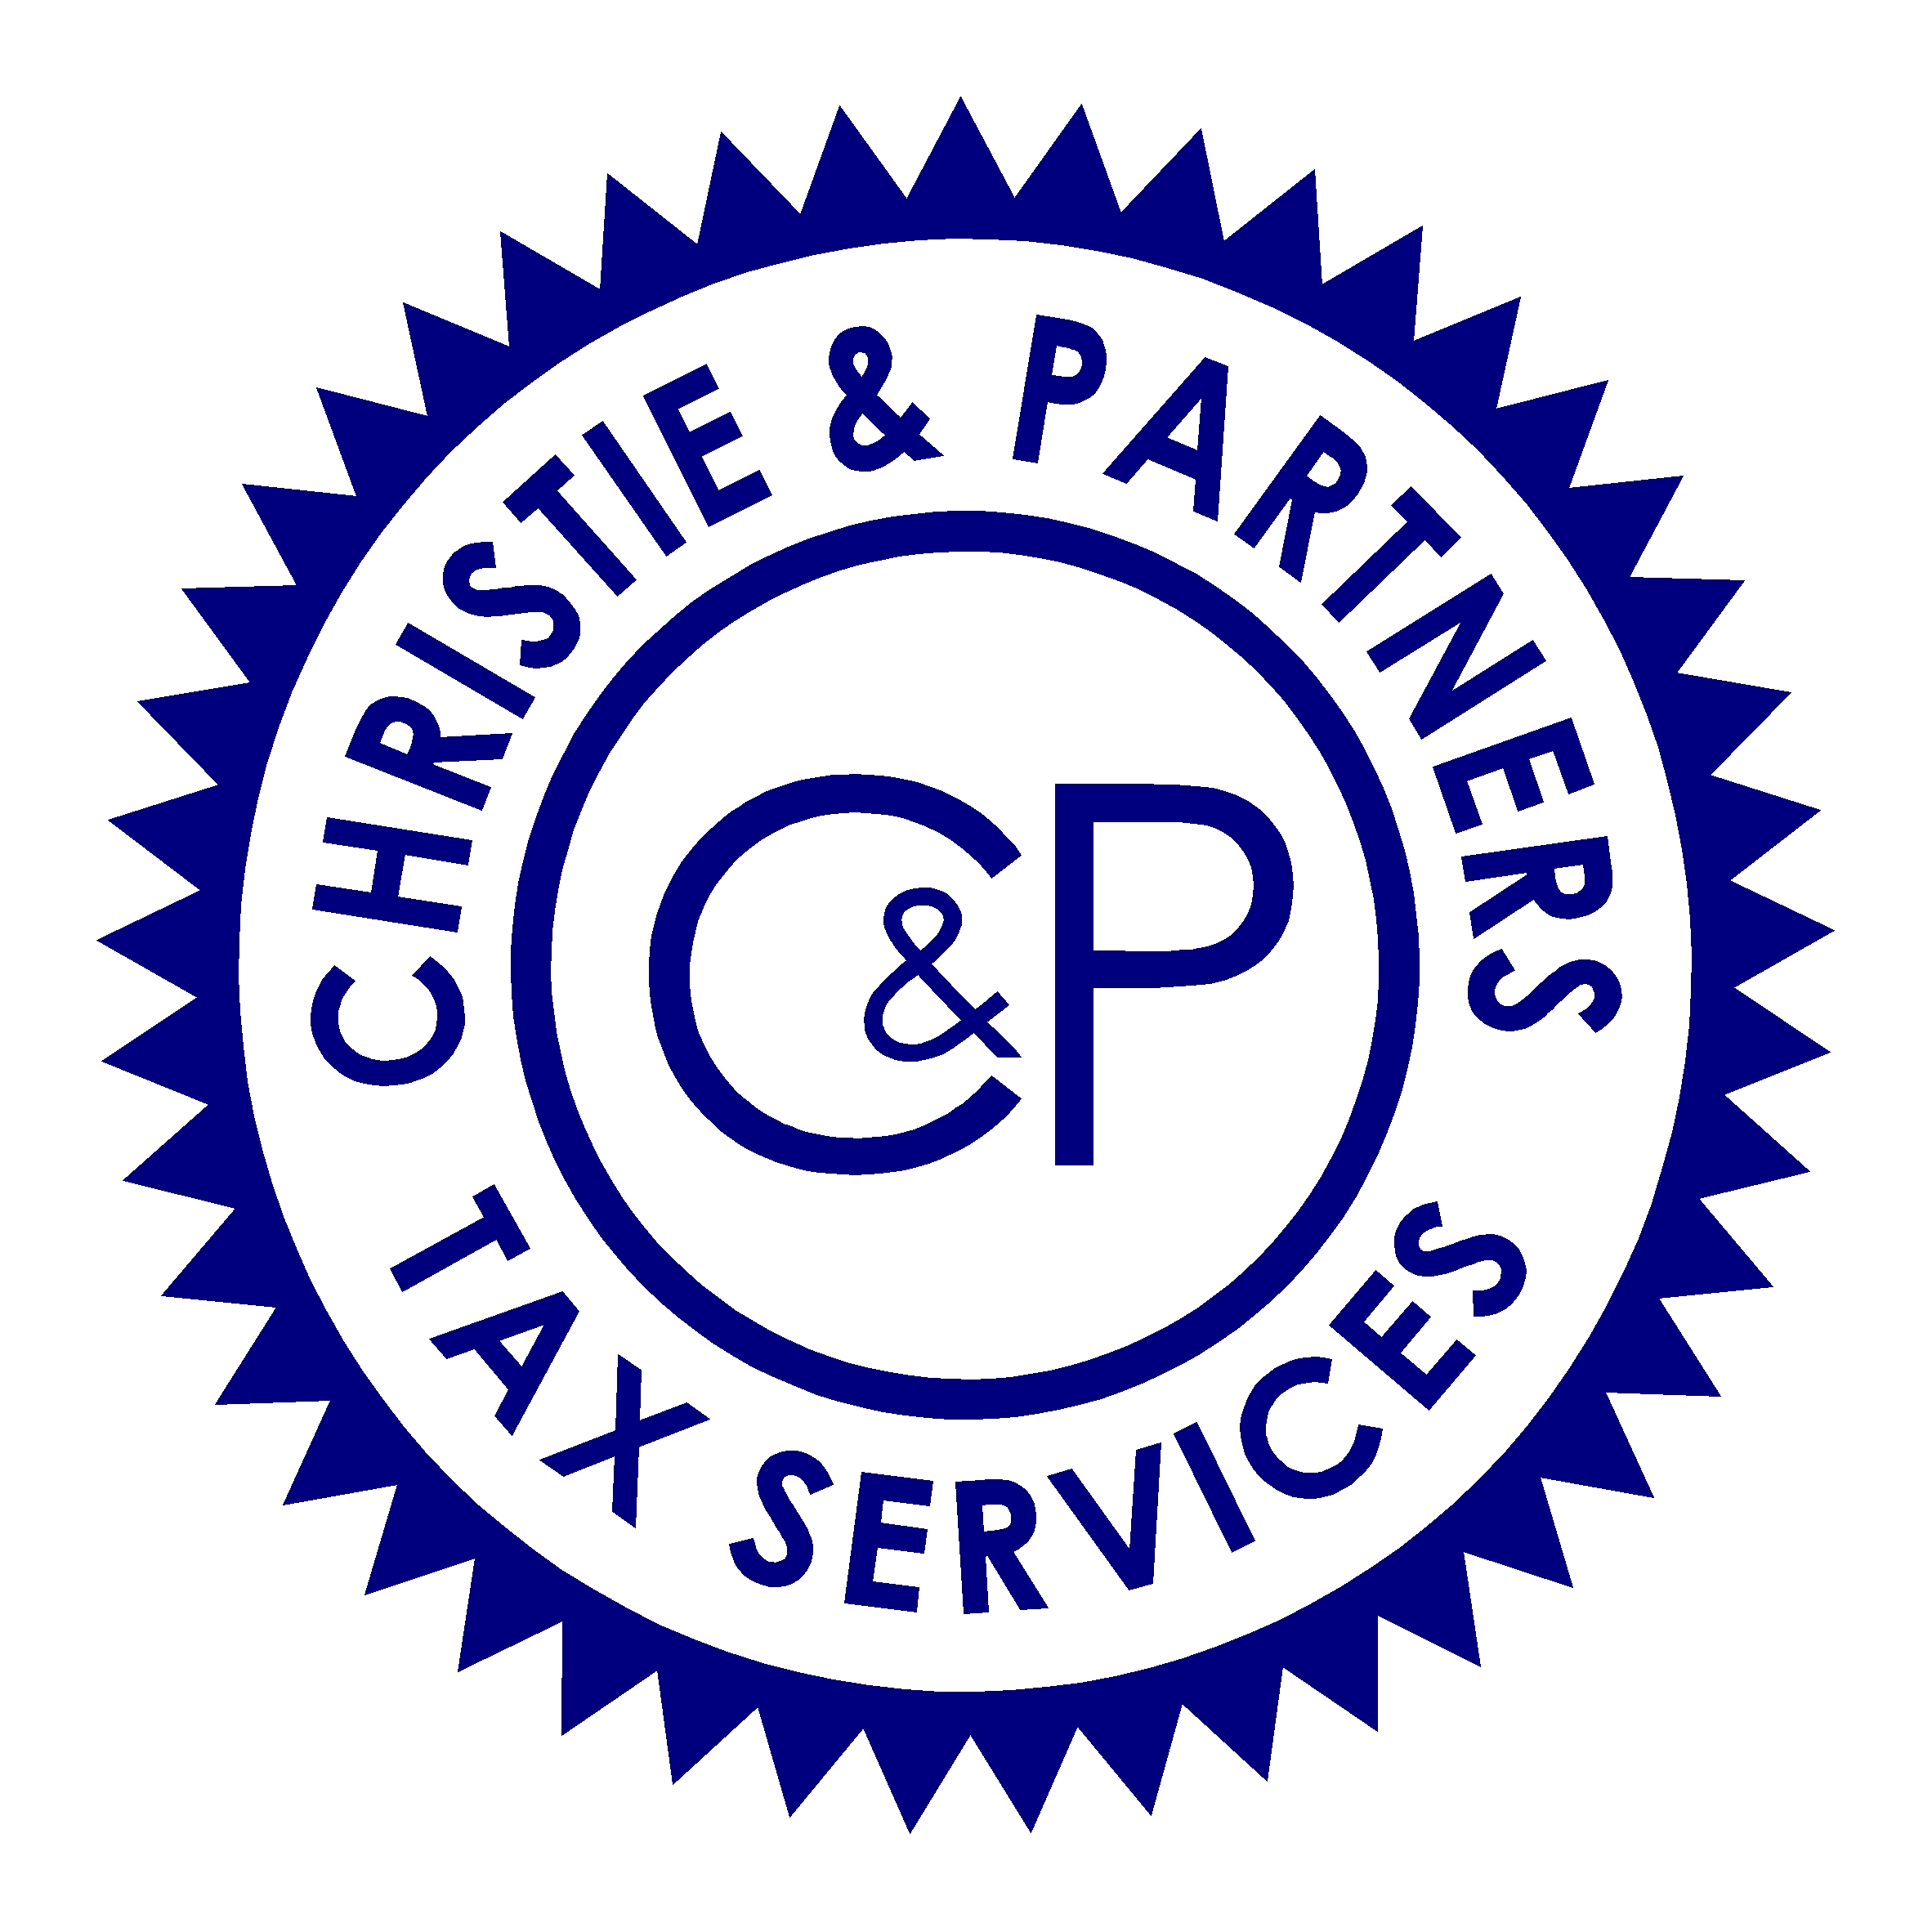 Christie & Partners Tax Services - West Leederville, WA 6007 - (08) 9388 9012 | ShowMeLocal.com